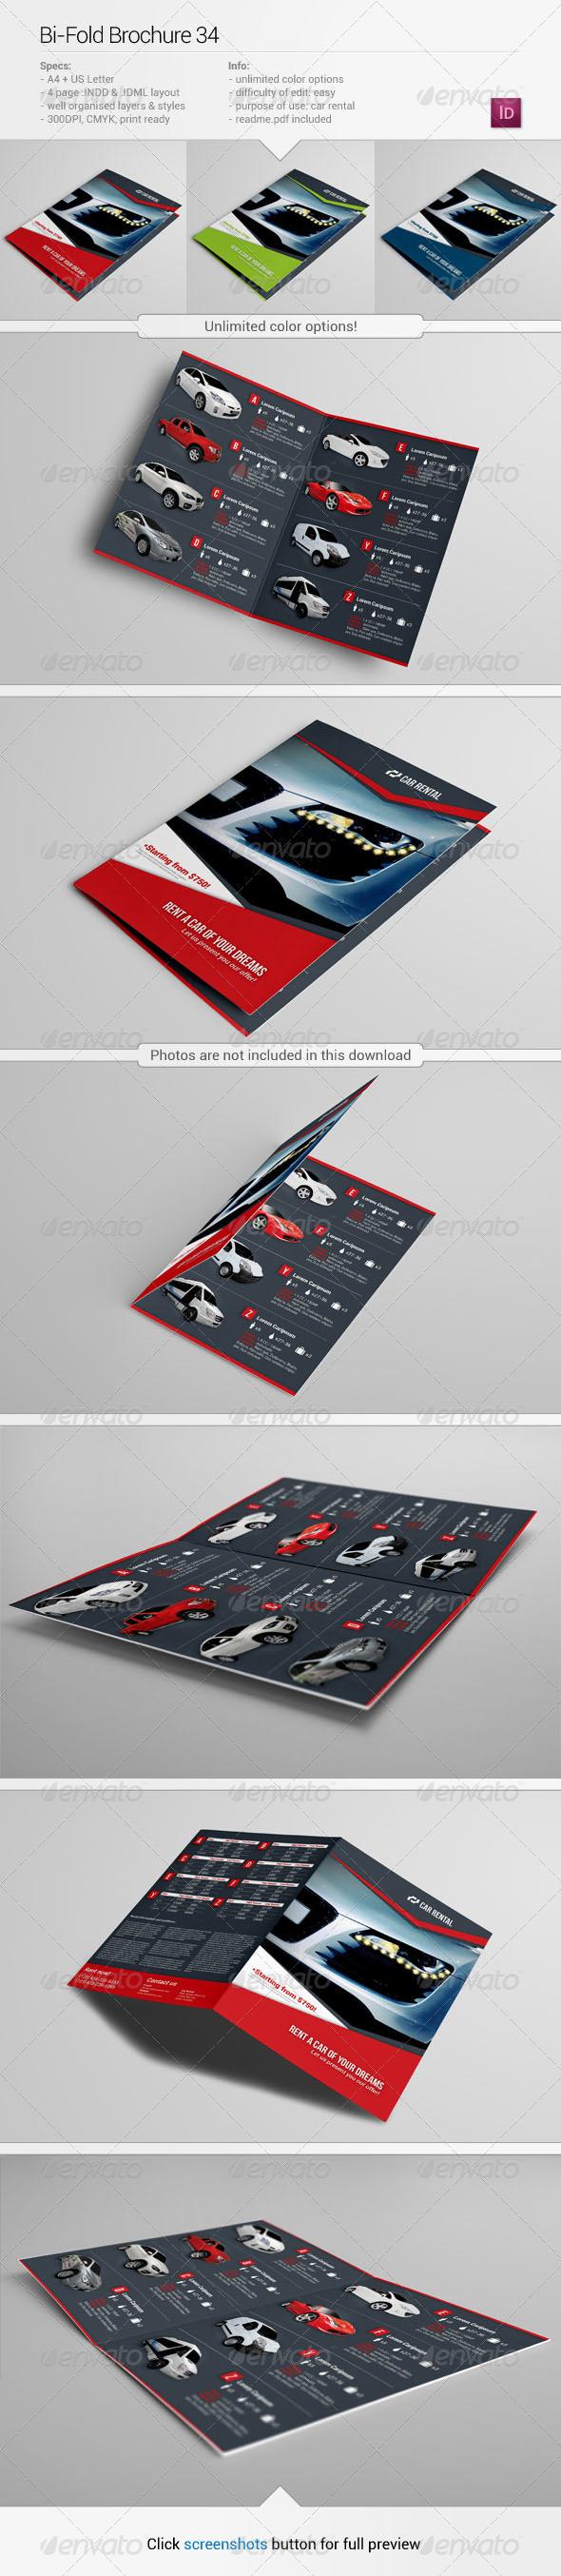 GraphicRiver Bi-Fold Brochure 34 5897797